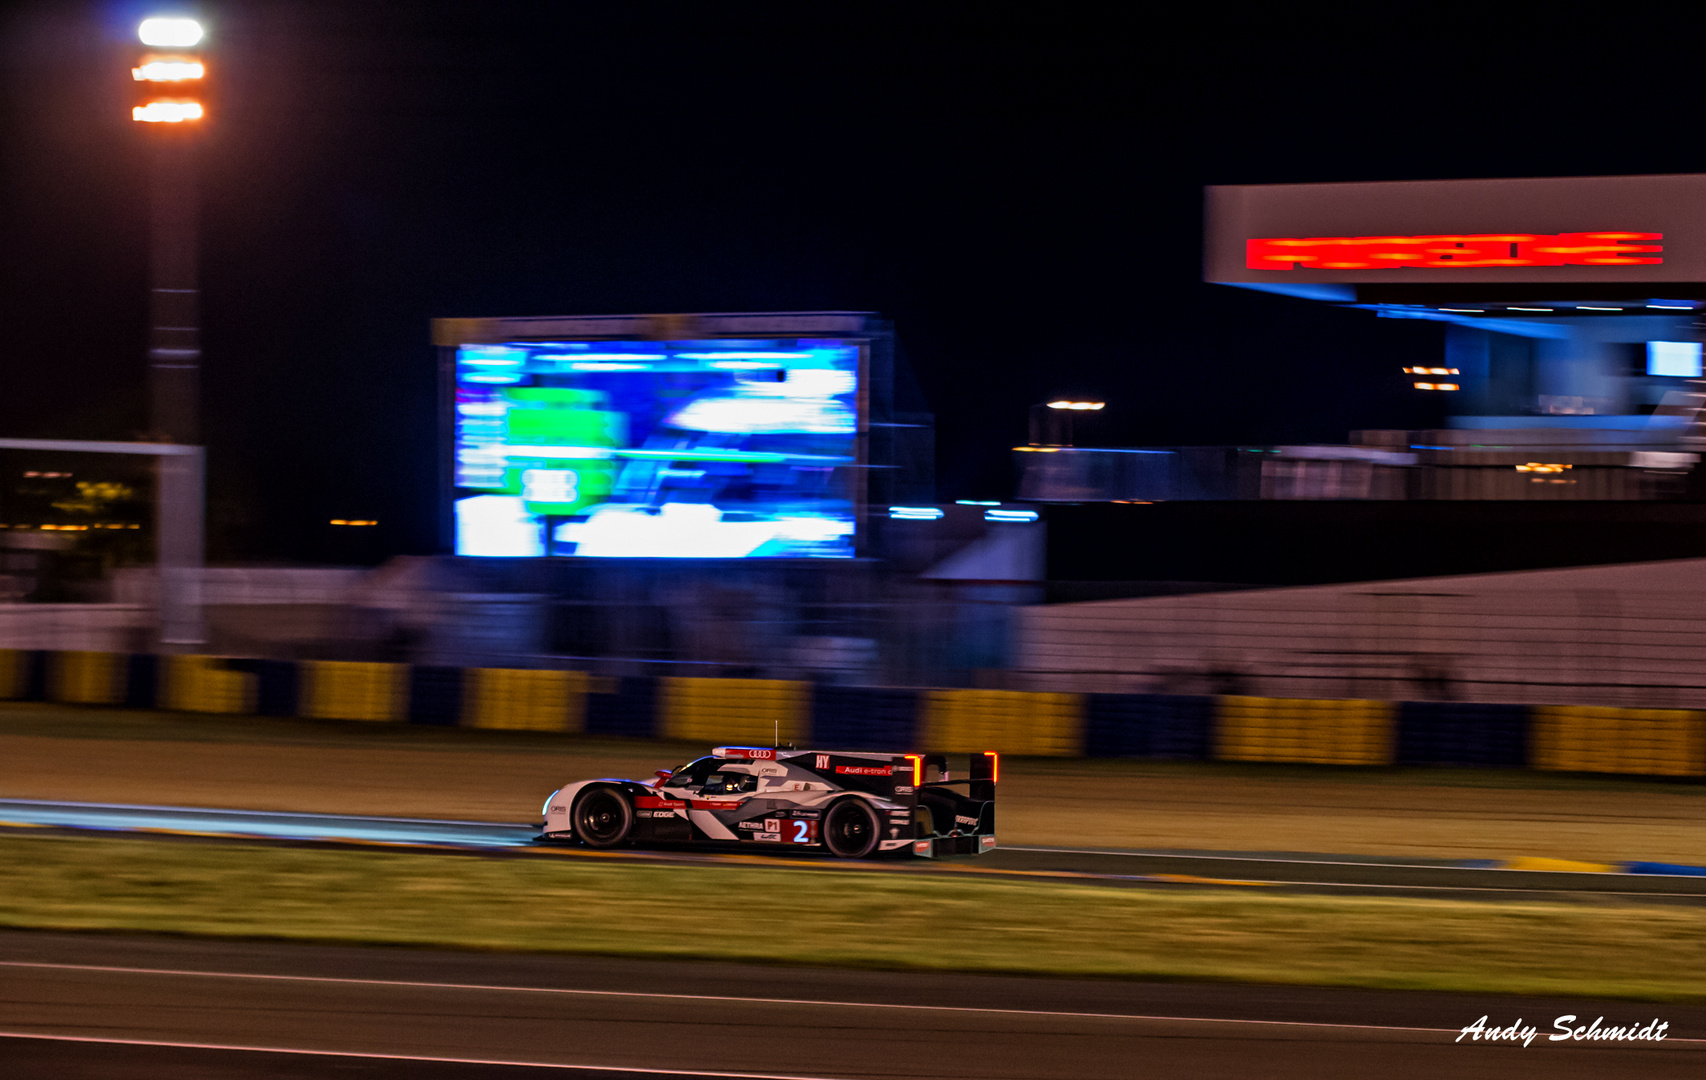 Le Mans Sieger bei Nacht :-) 2014